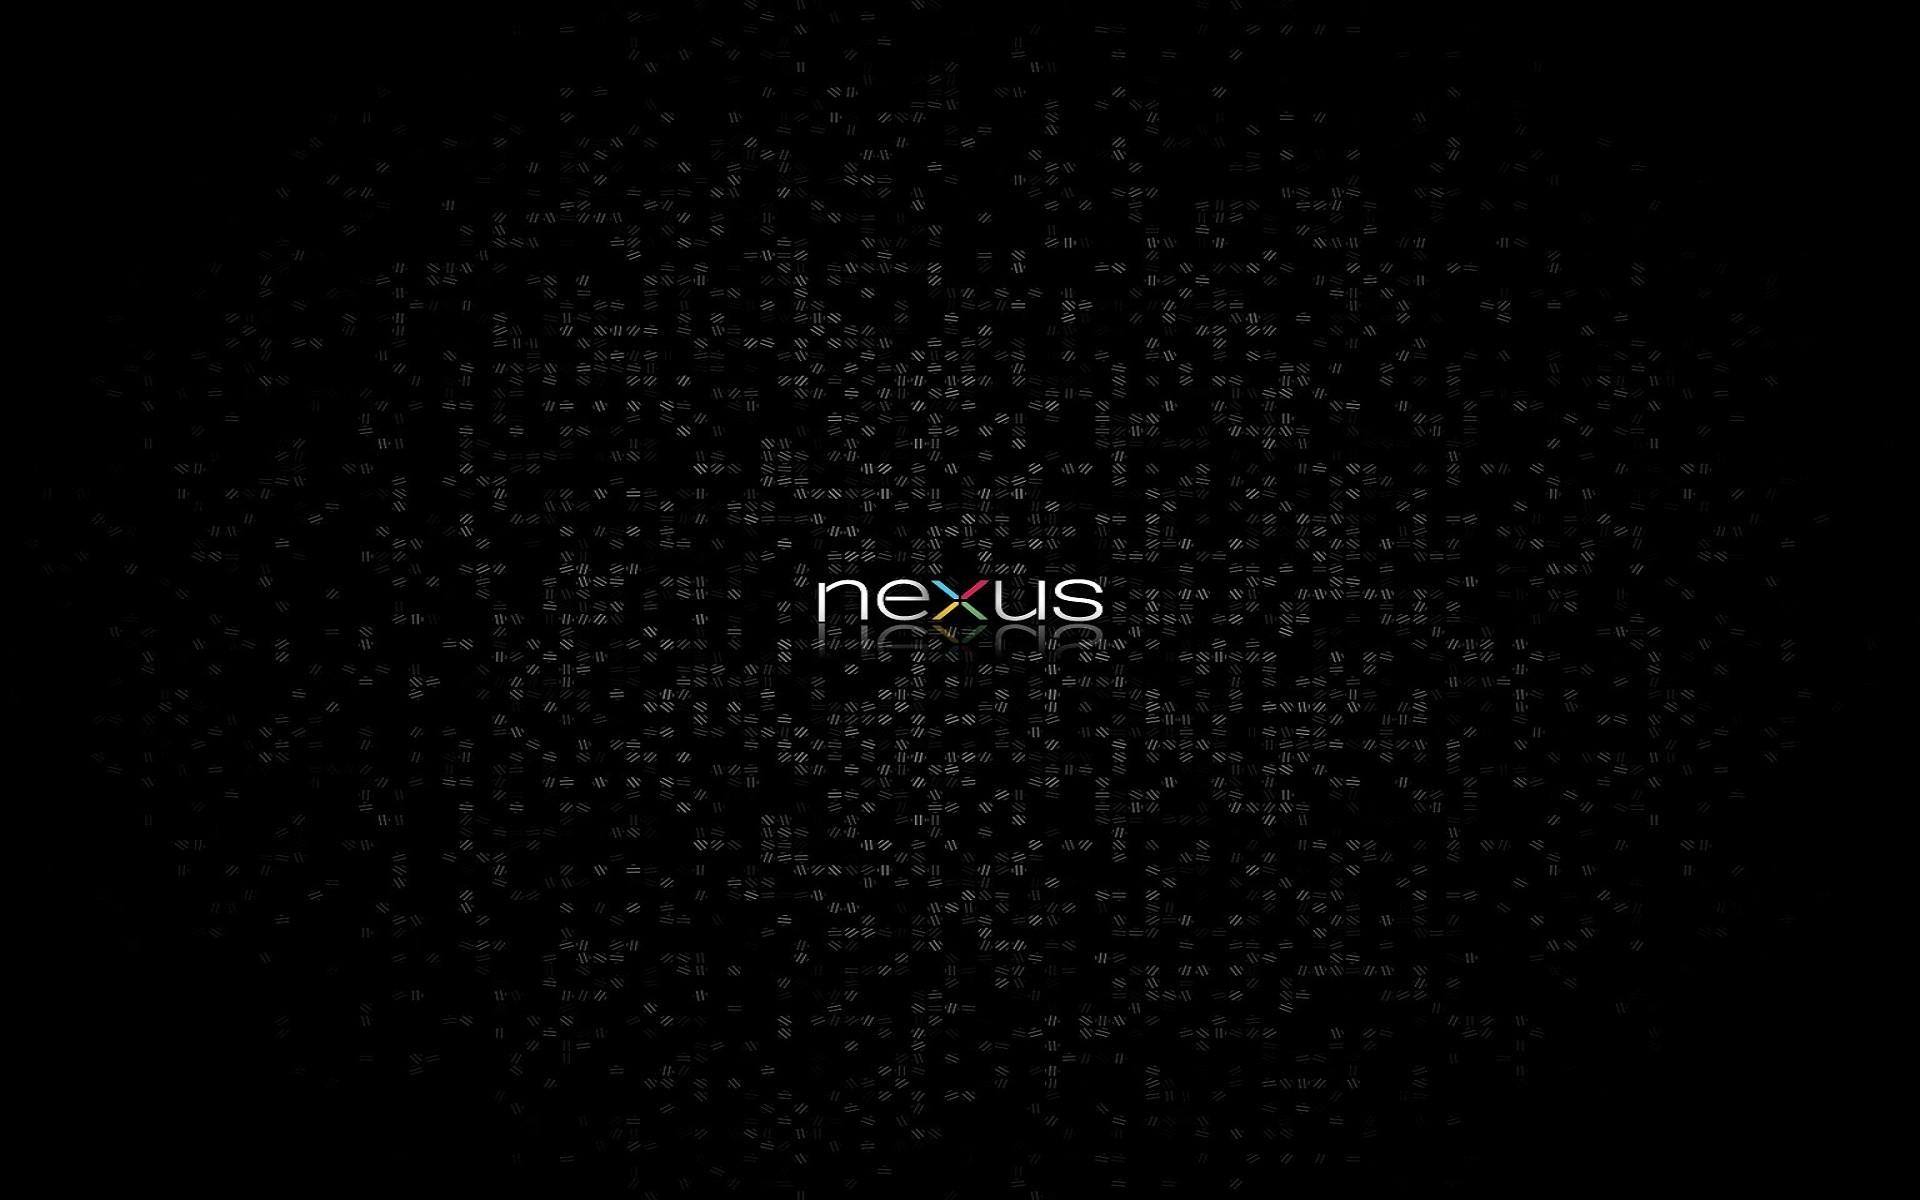 hd nexus wallpaper 183��